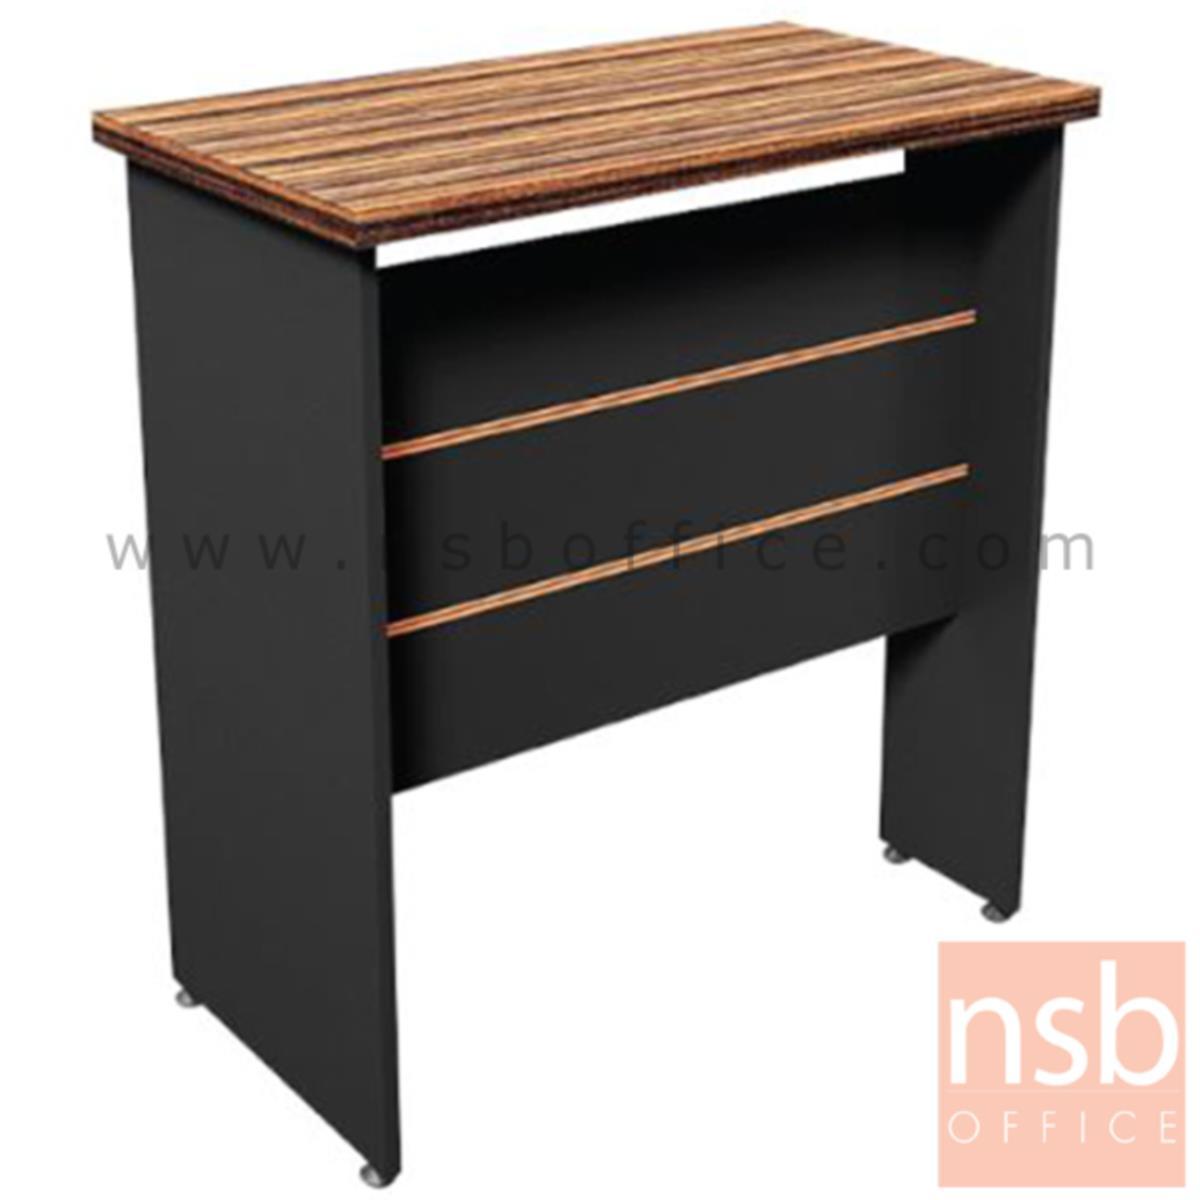 A26A016:โต๊ะเข้ามุม  รุ่น Vetiver (เวททิเวอร์) ขนาด 80W cm. ขาไม้ สีลายไม้ซีบราโน่ตัดดำ ขอบ ROSEGOLD